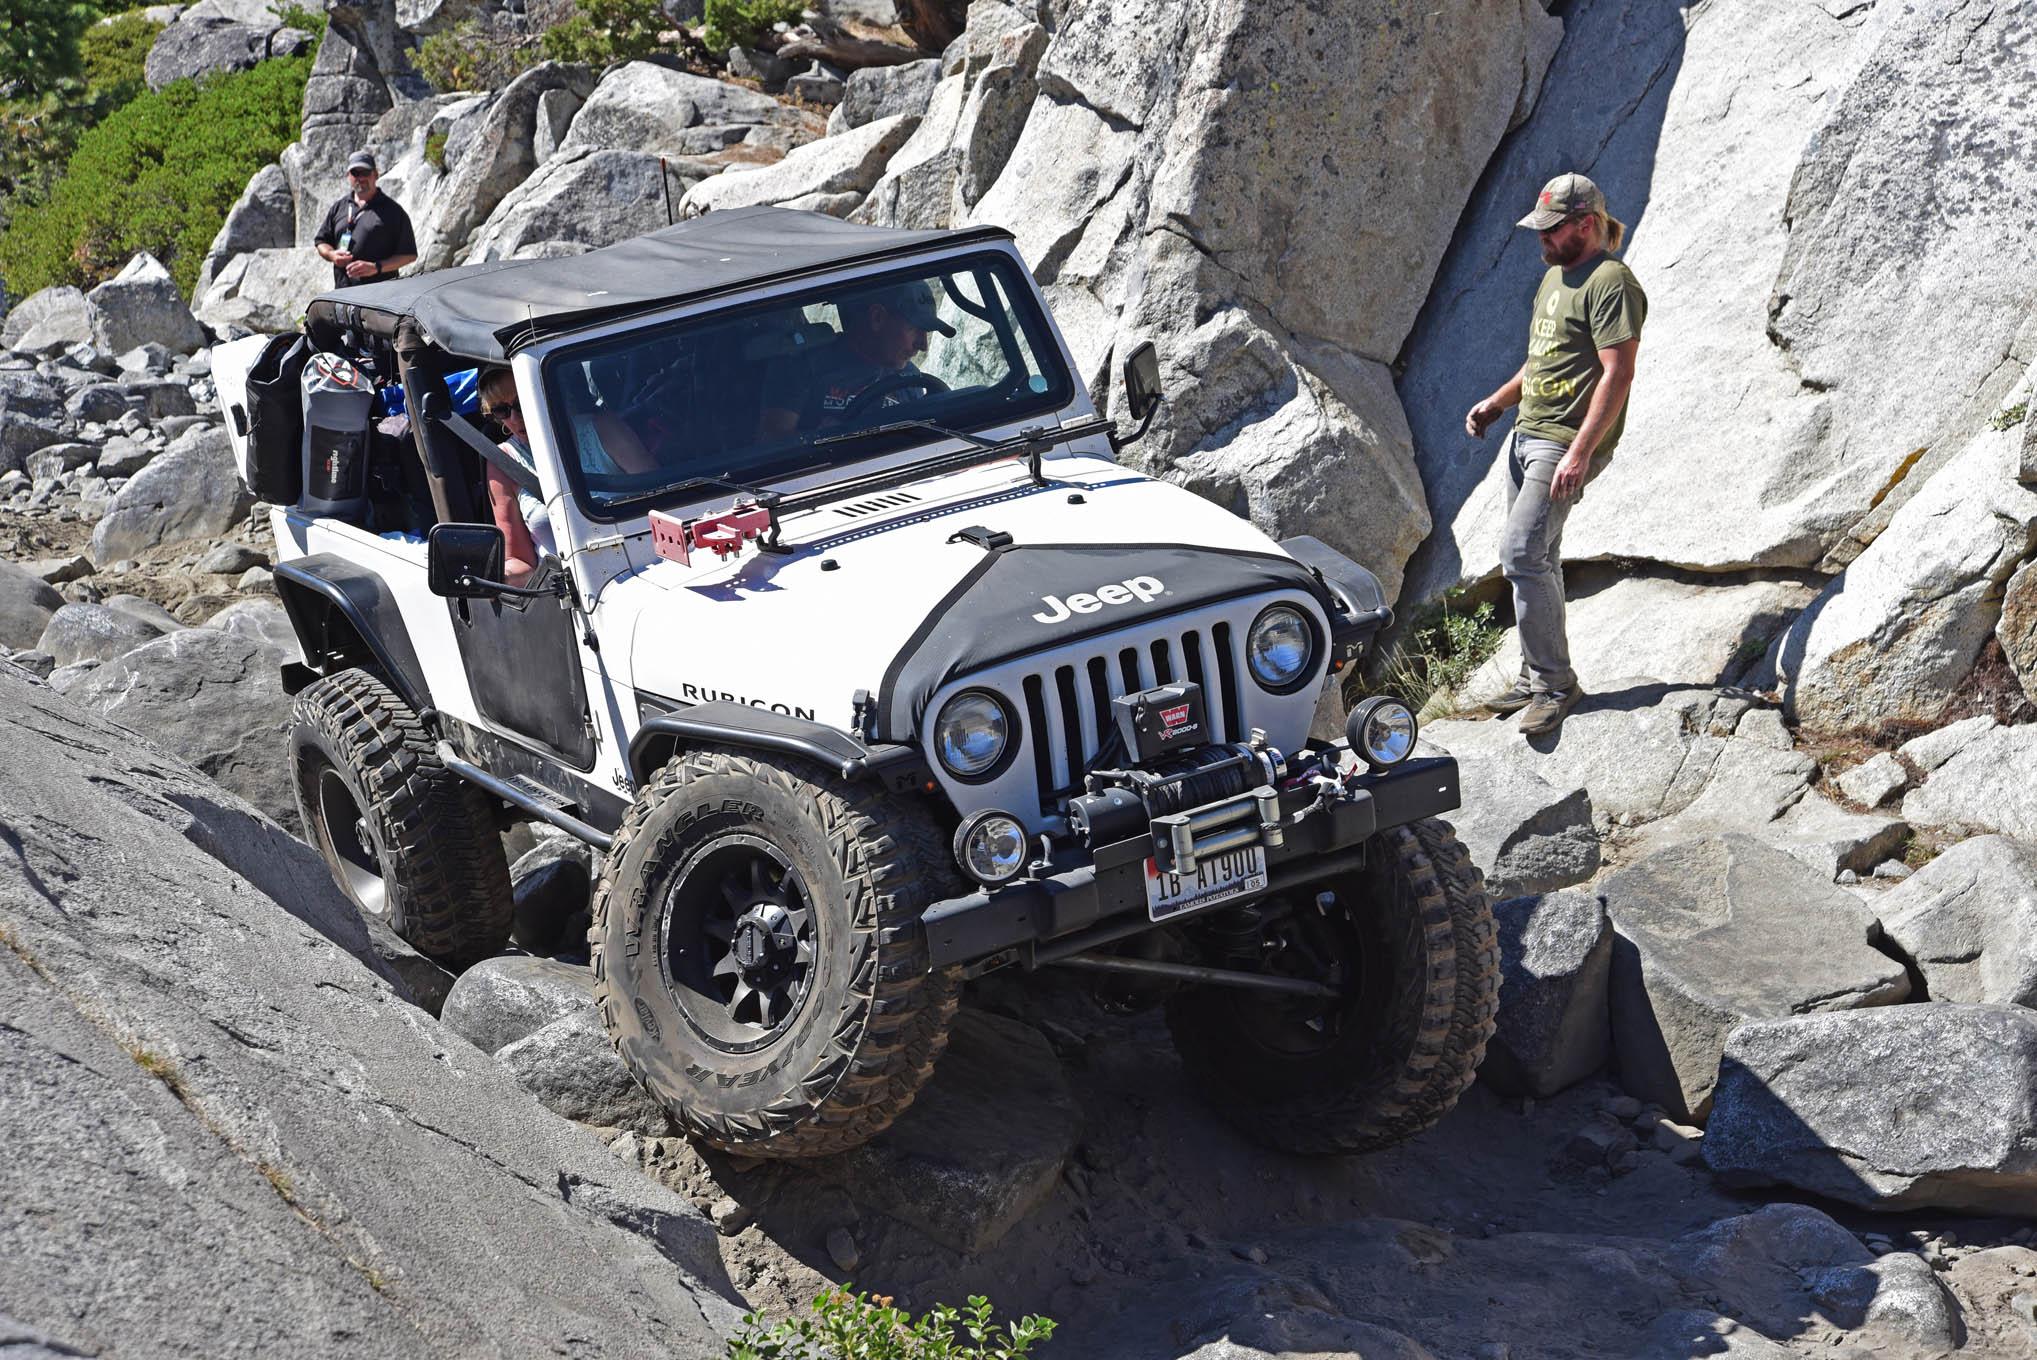 049 rubicon trail modern jeeper adventures metal cloak 2019 stuart bourdon